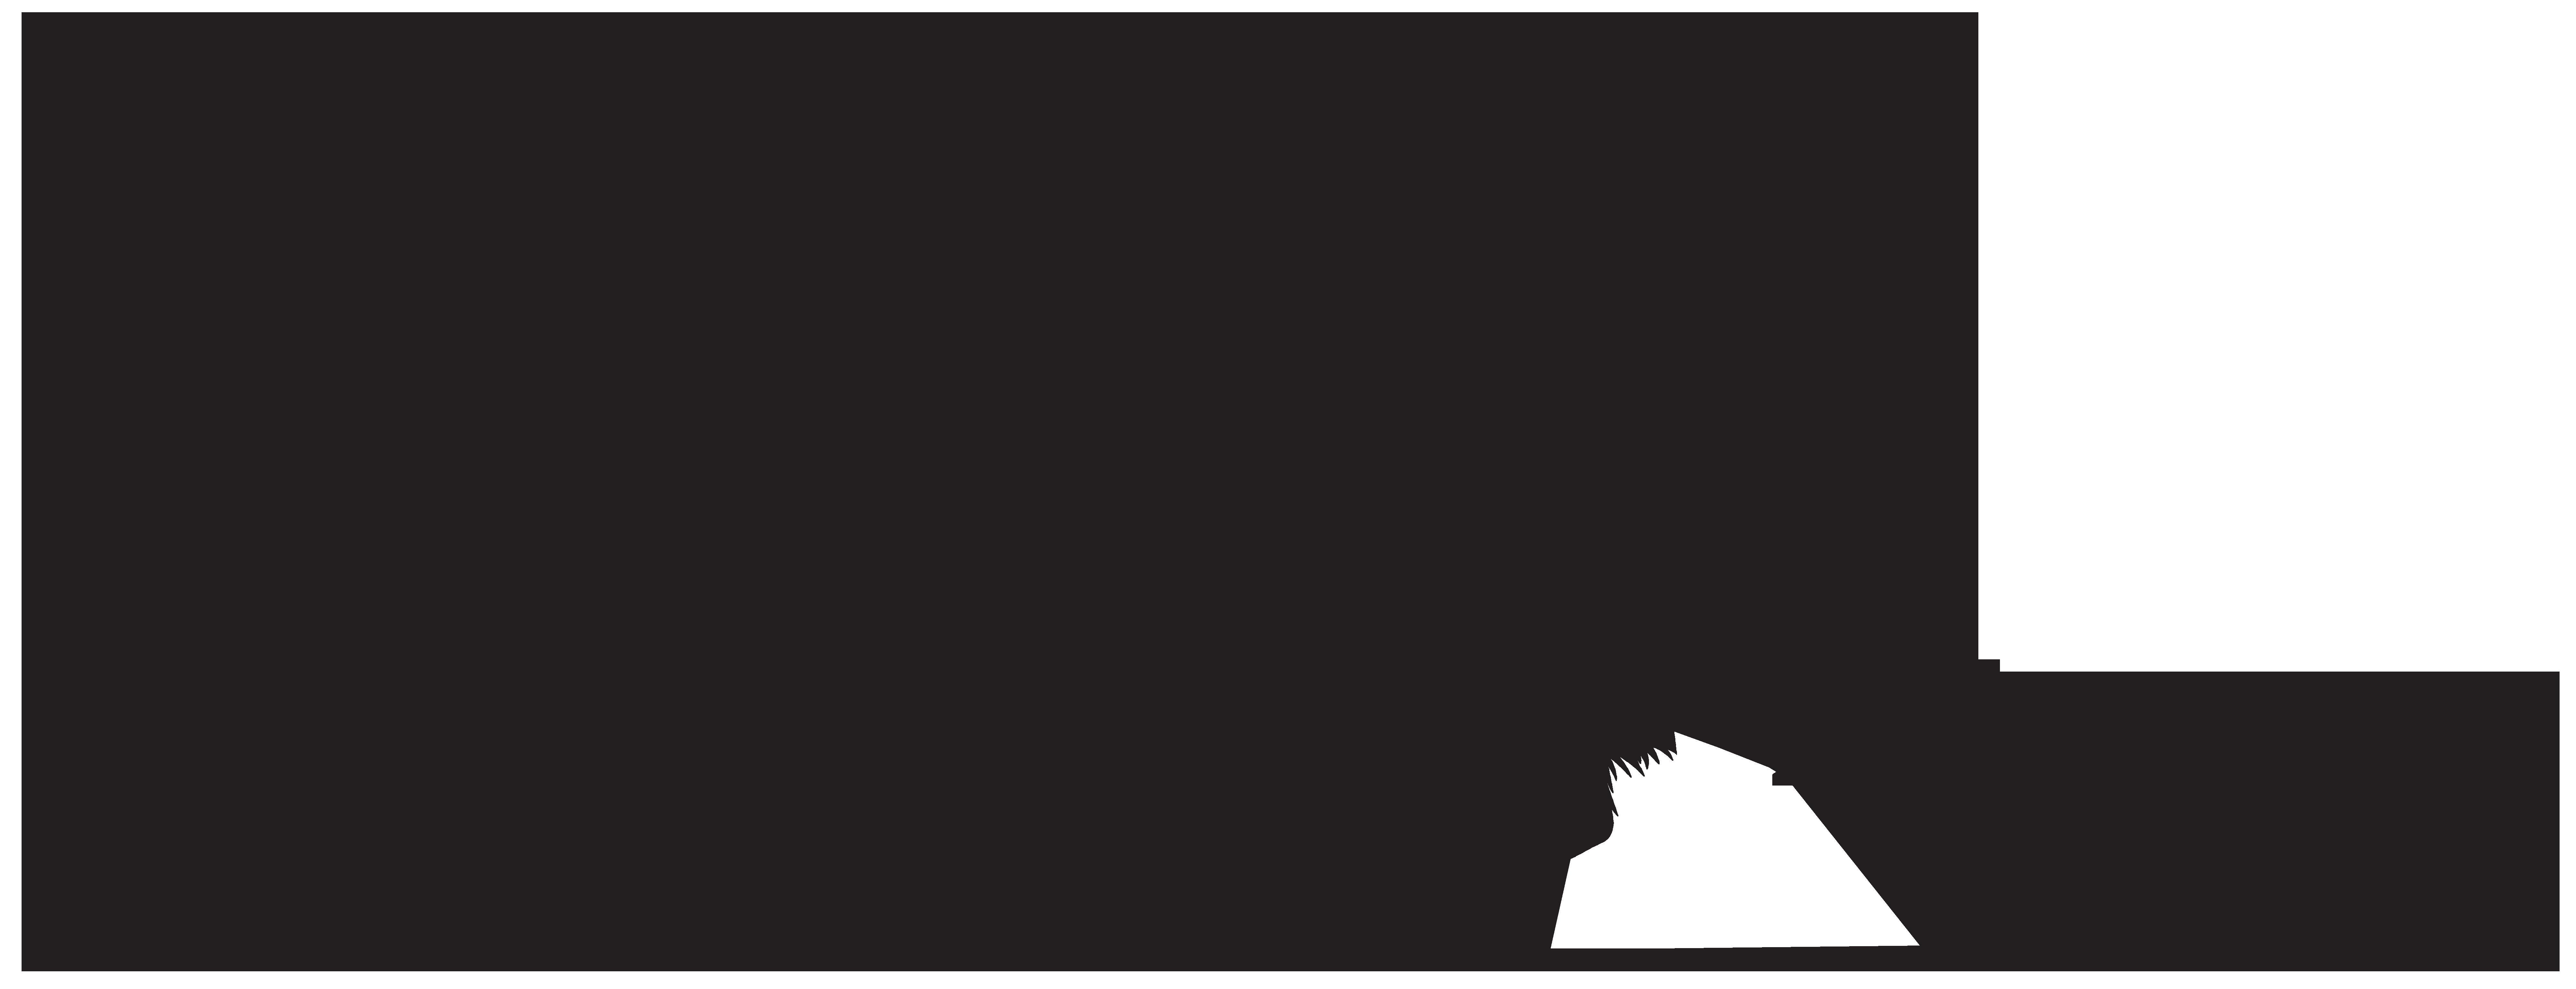 8000x3072 Beaver Silhouette Png Clip Art Imageu200b Gallery Yopriceville